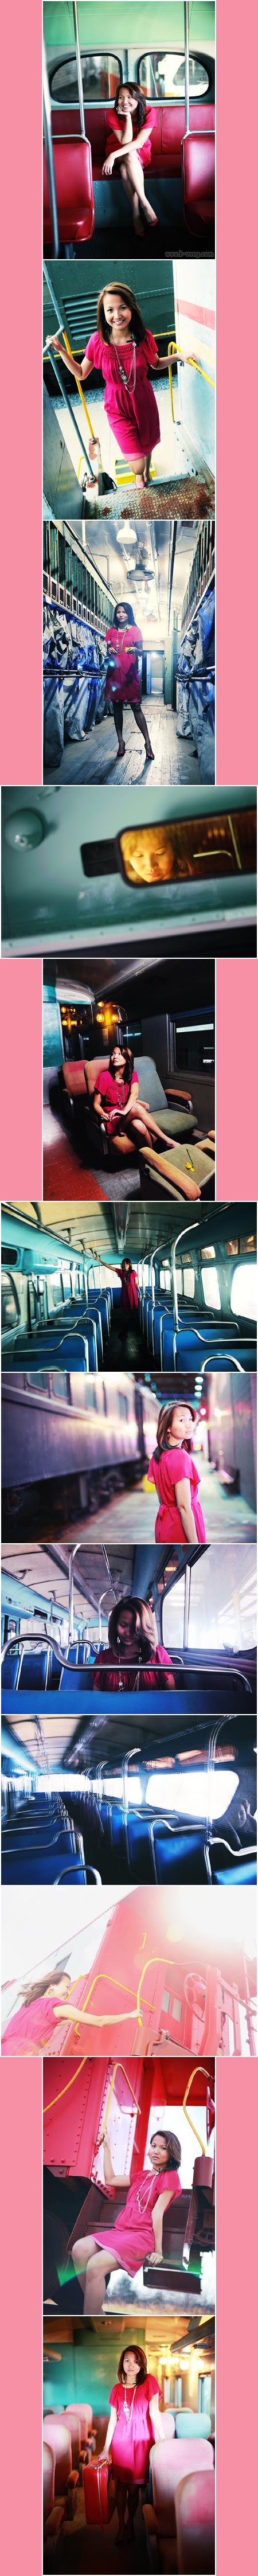 w_b-vong.com_pix_railway